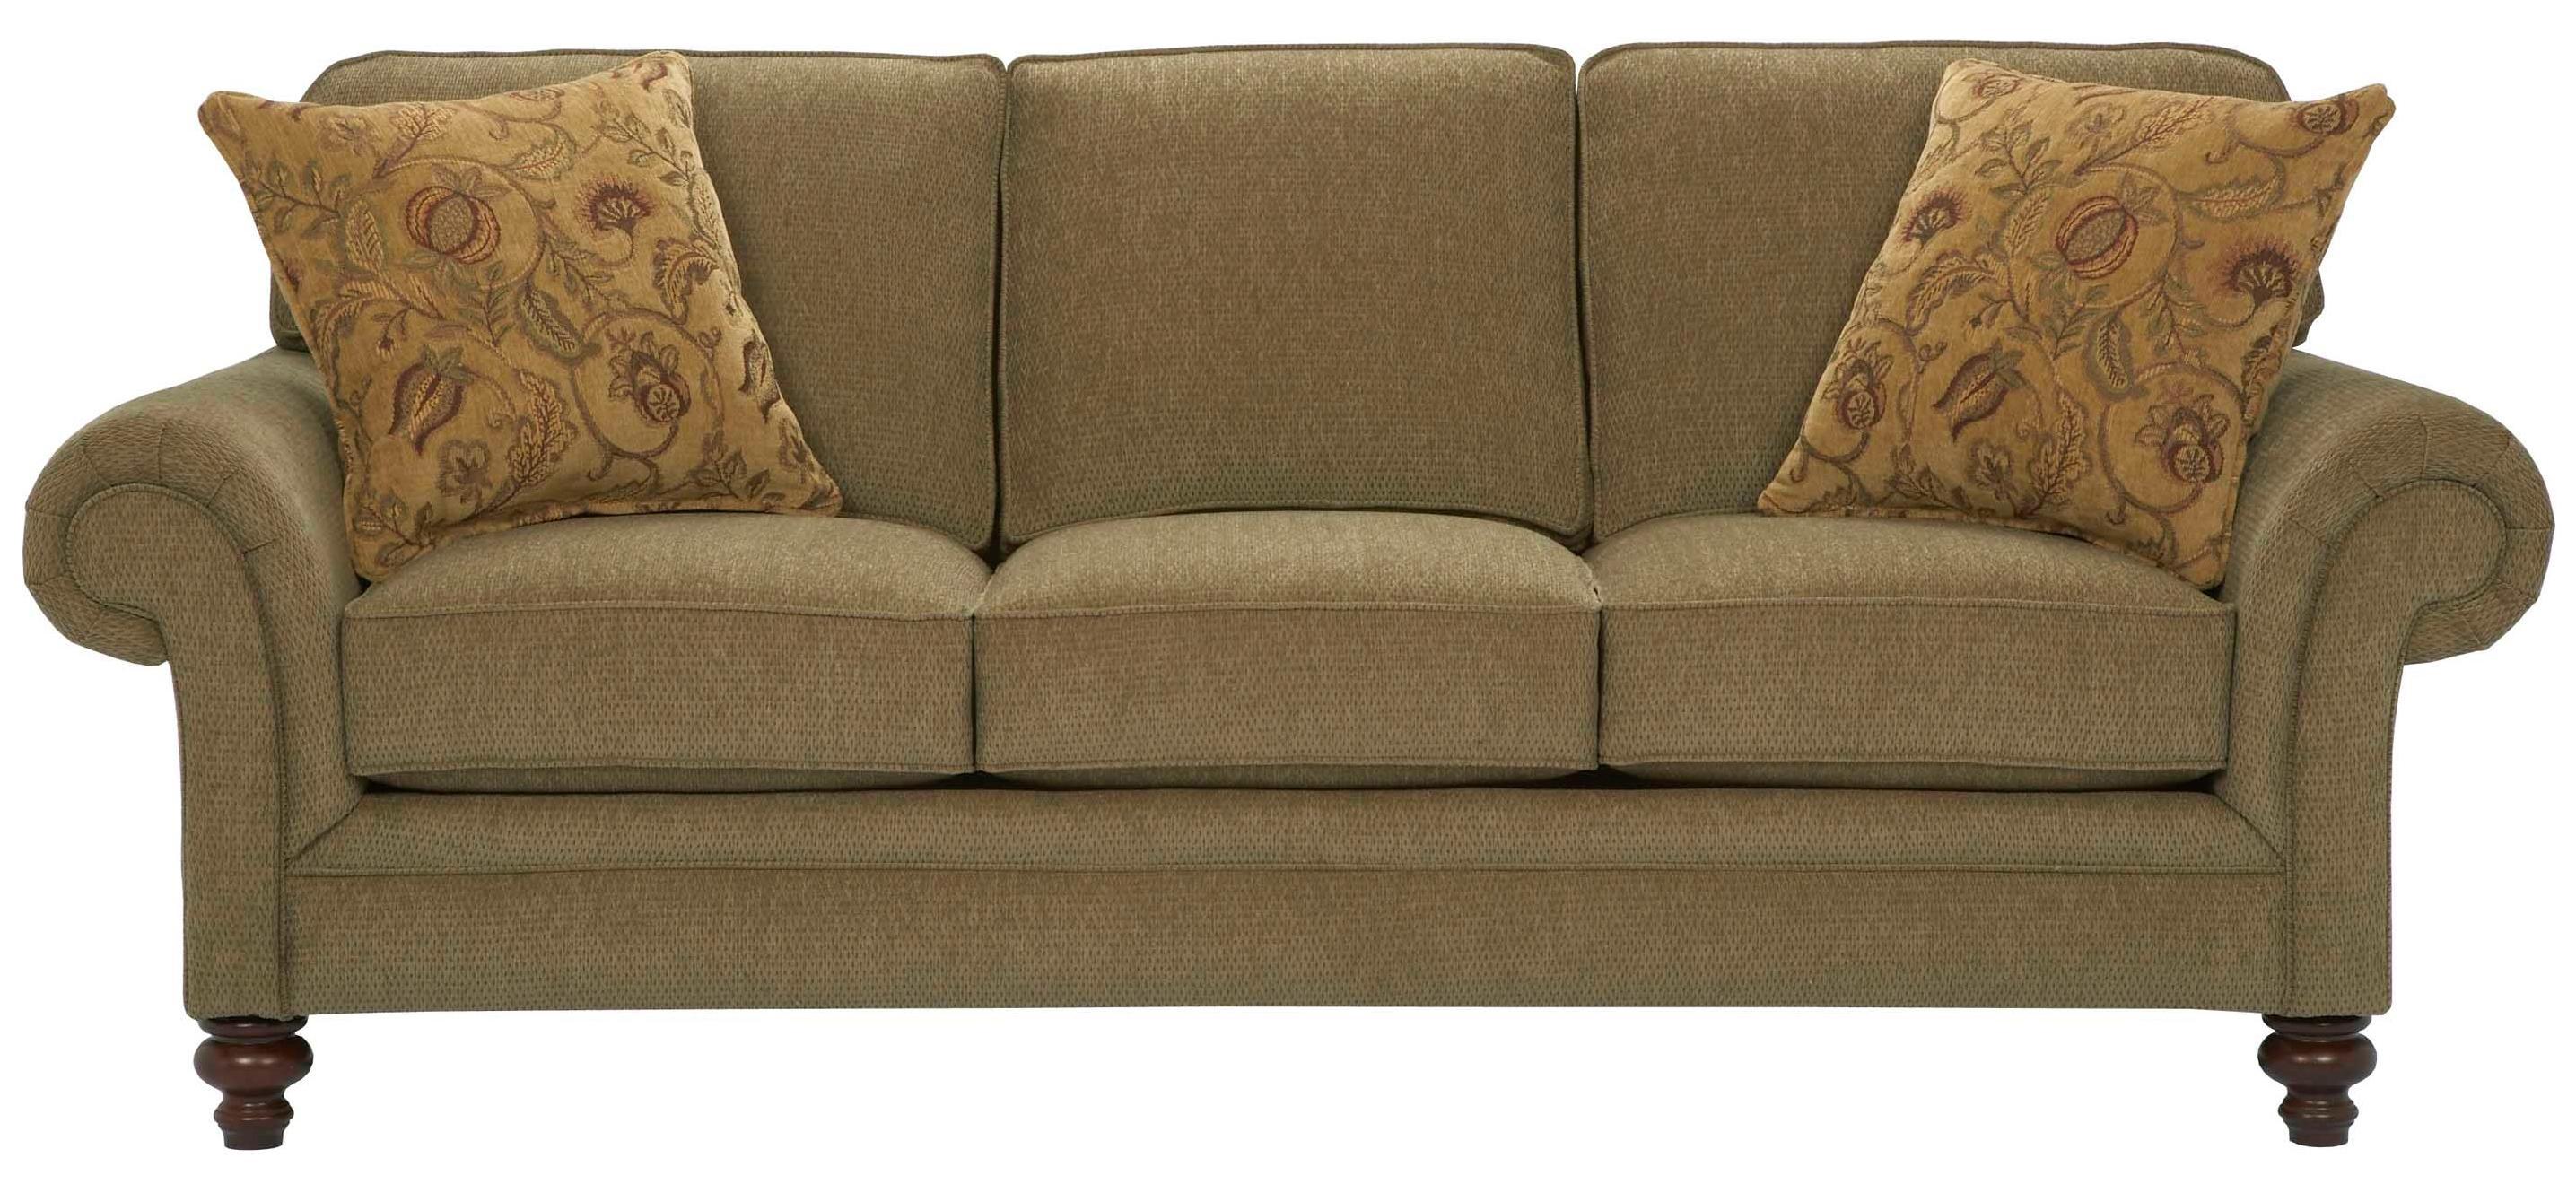 Broyhill Furniture Larissa Queen Air Dream Sleeper  - Item Number: 6112-7A